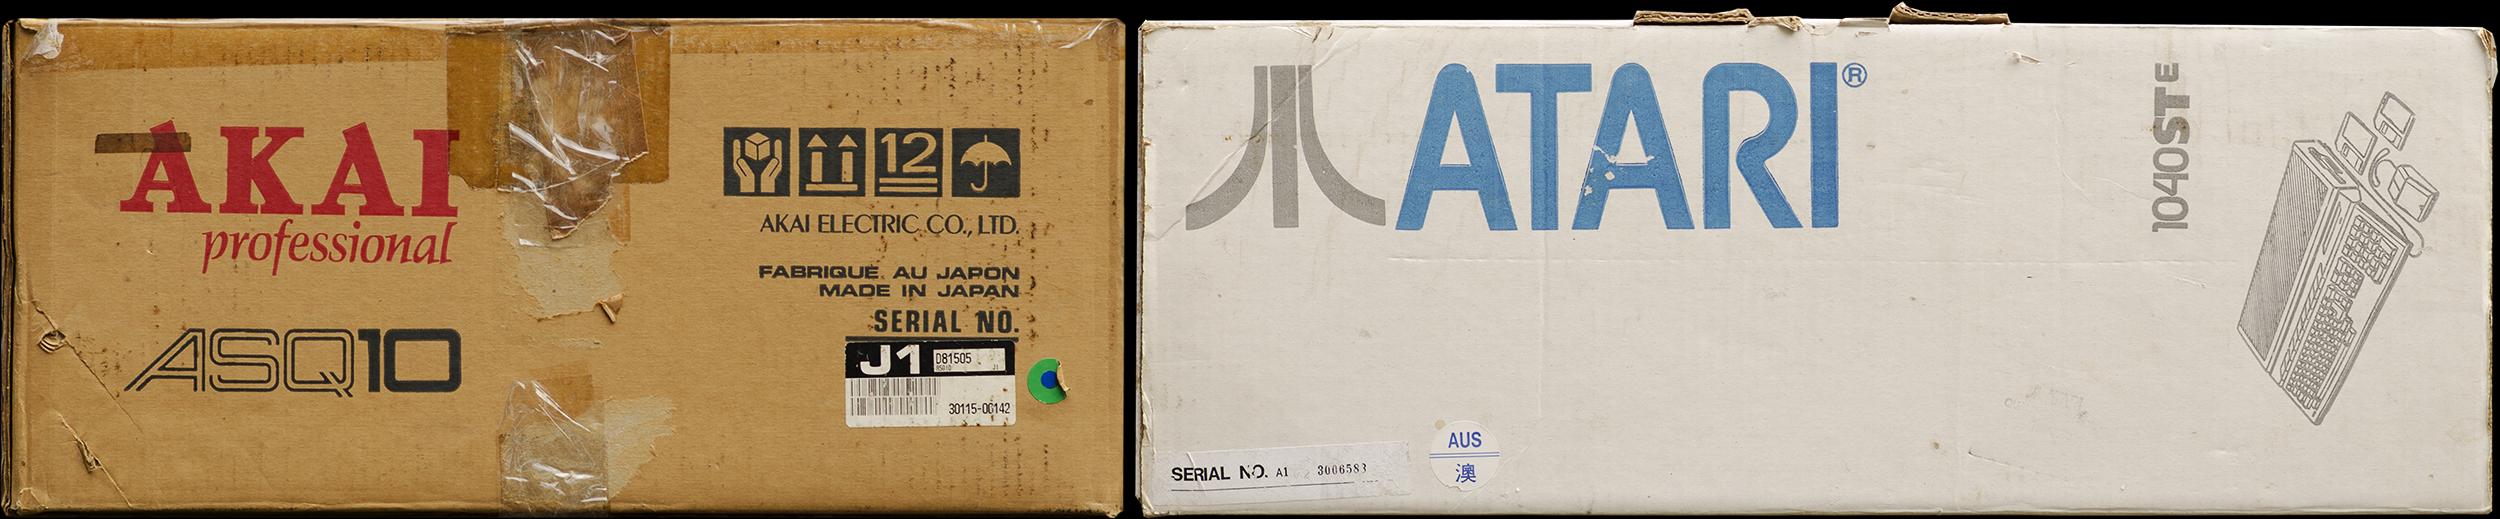 ASQ 1040 Cartons 1A.jpg